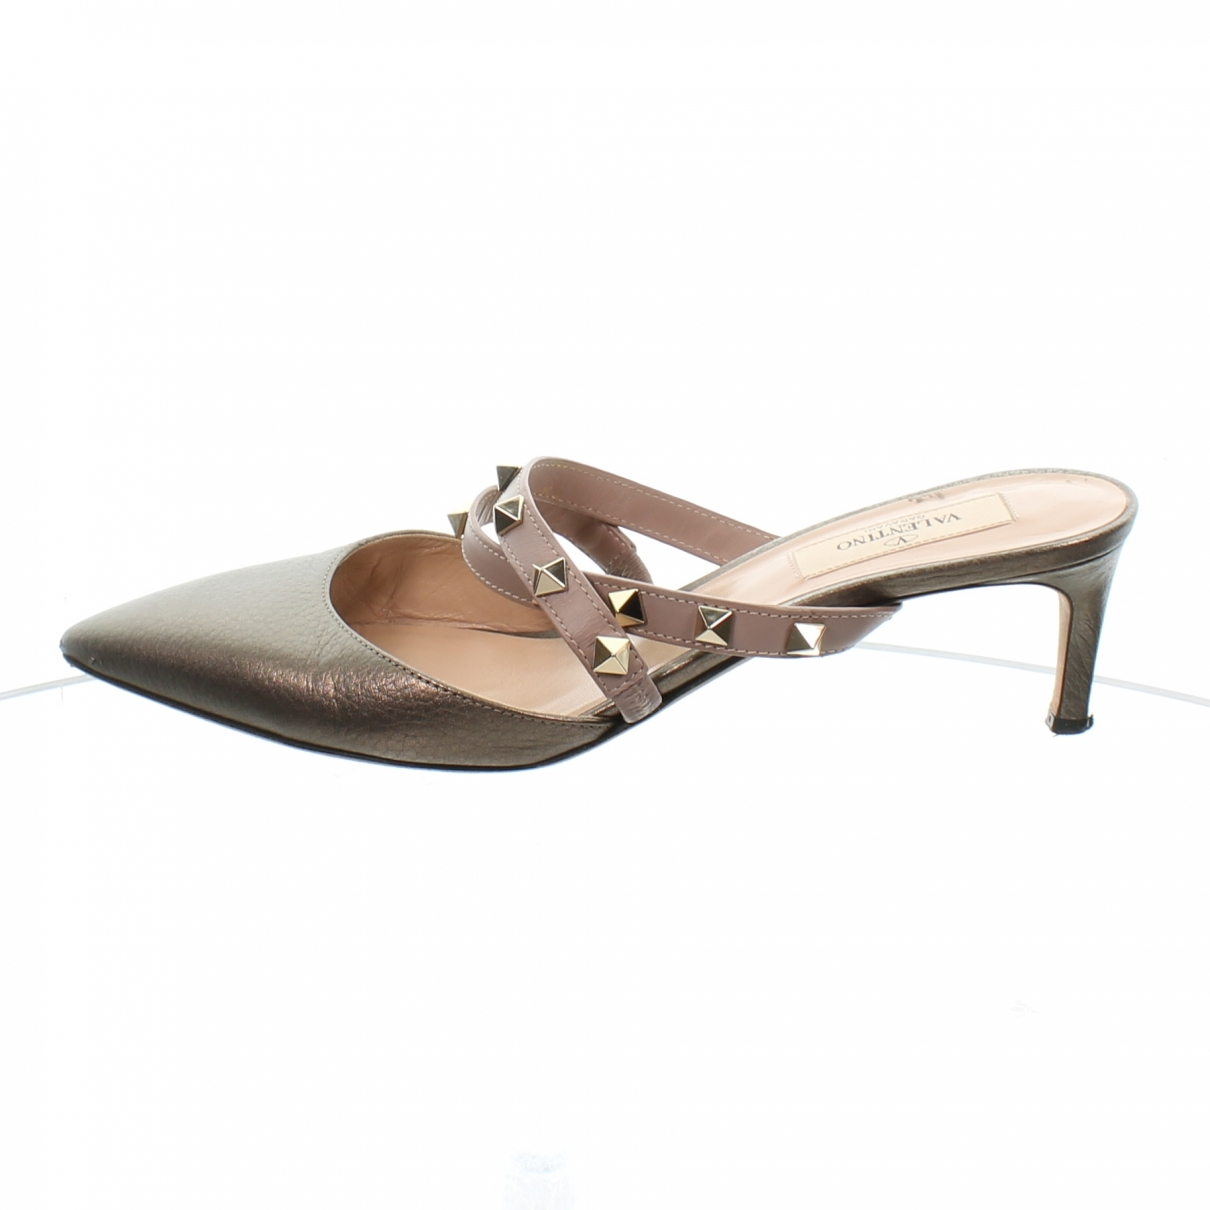 Valentino Garavani \N Metallic Leather Mules & Clogs for Women 37.5 EU